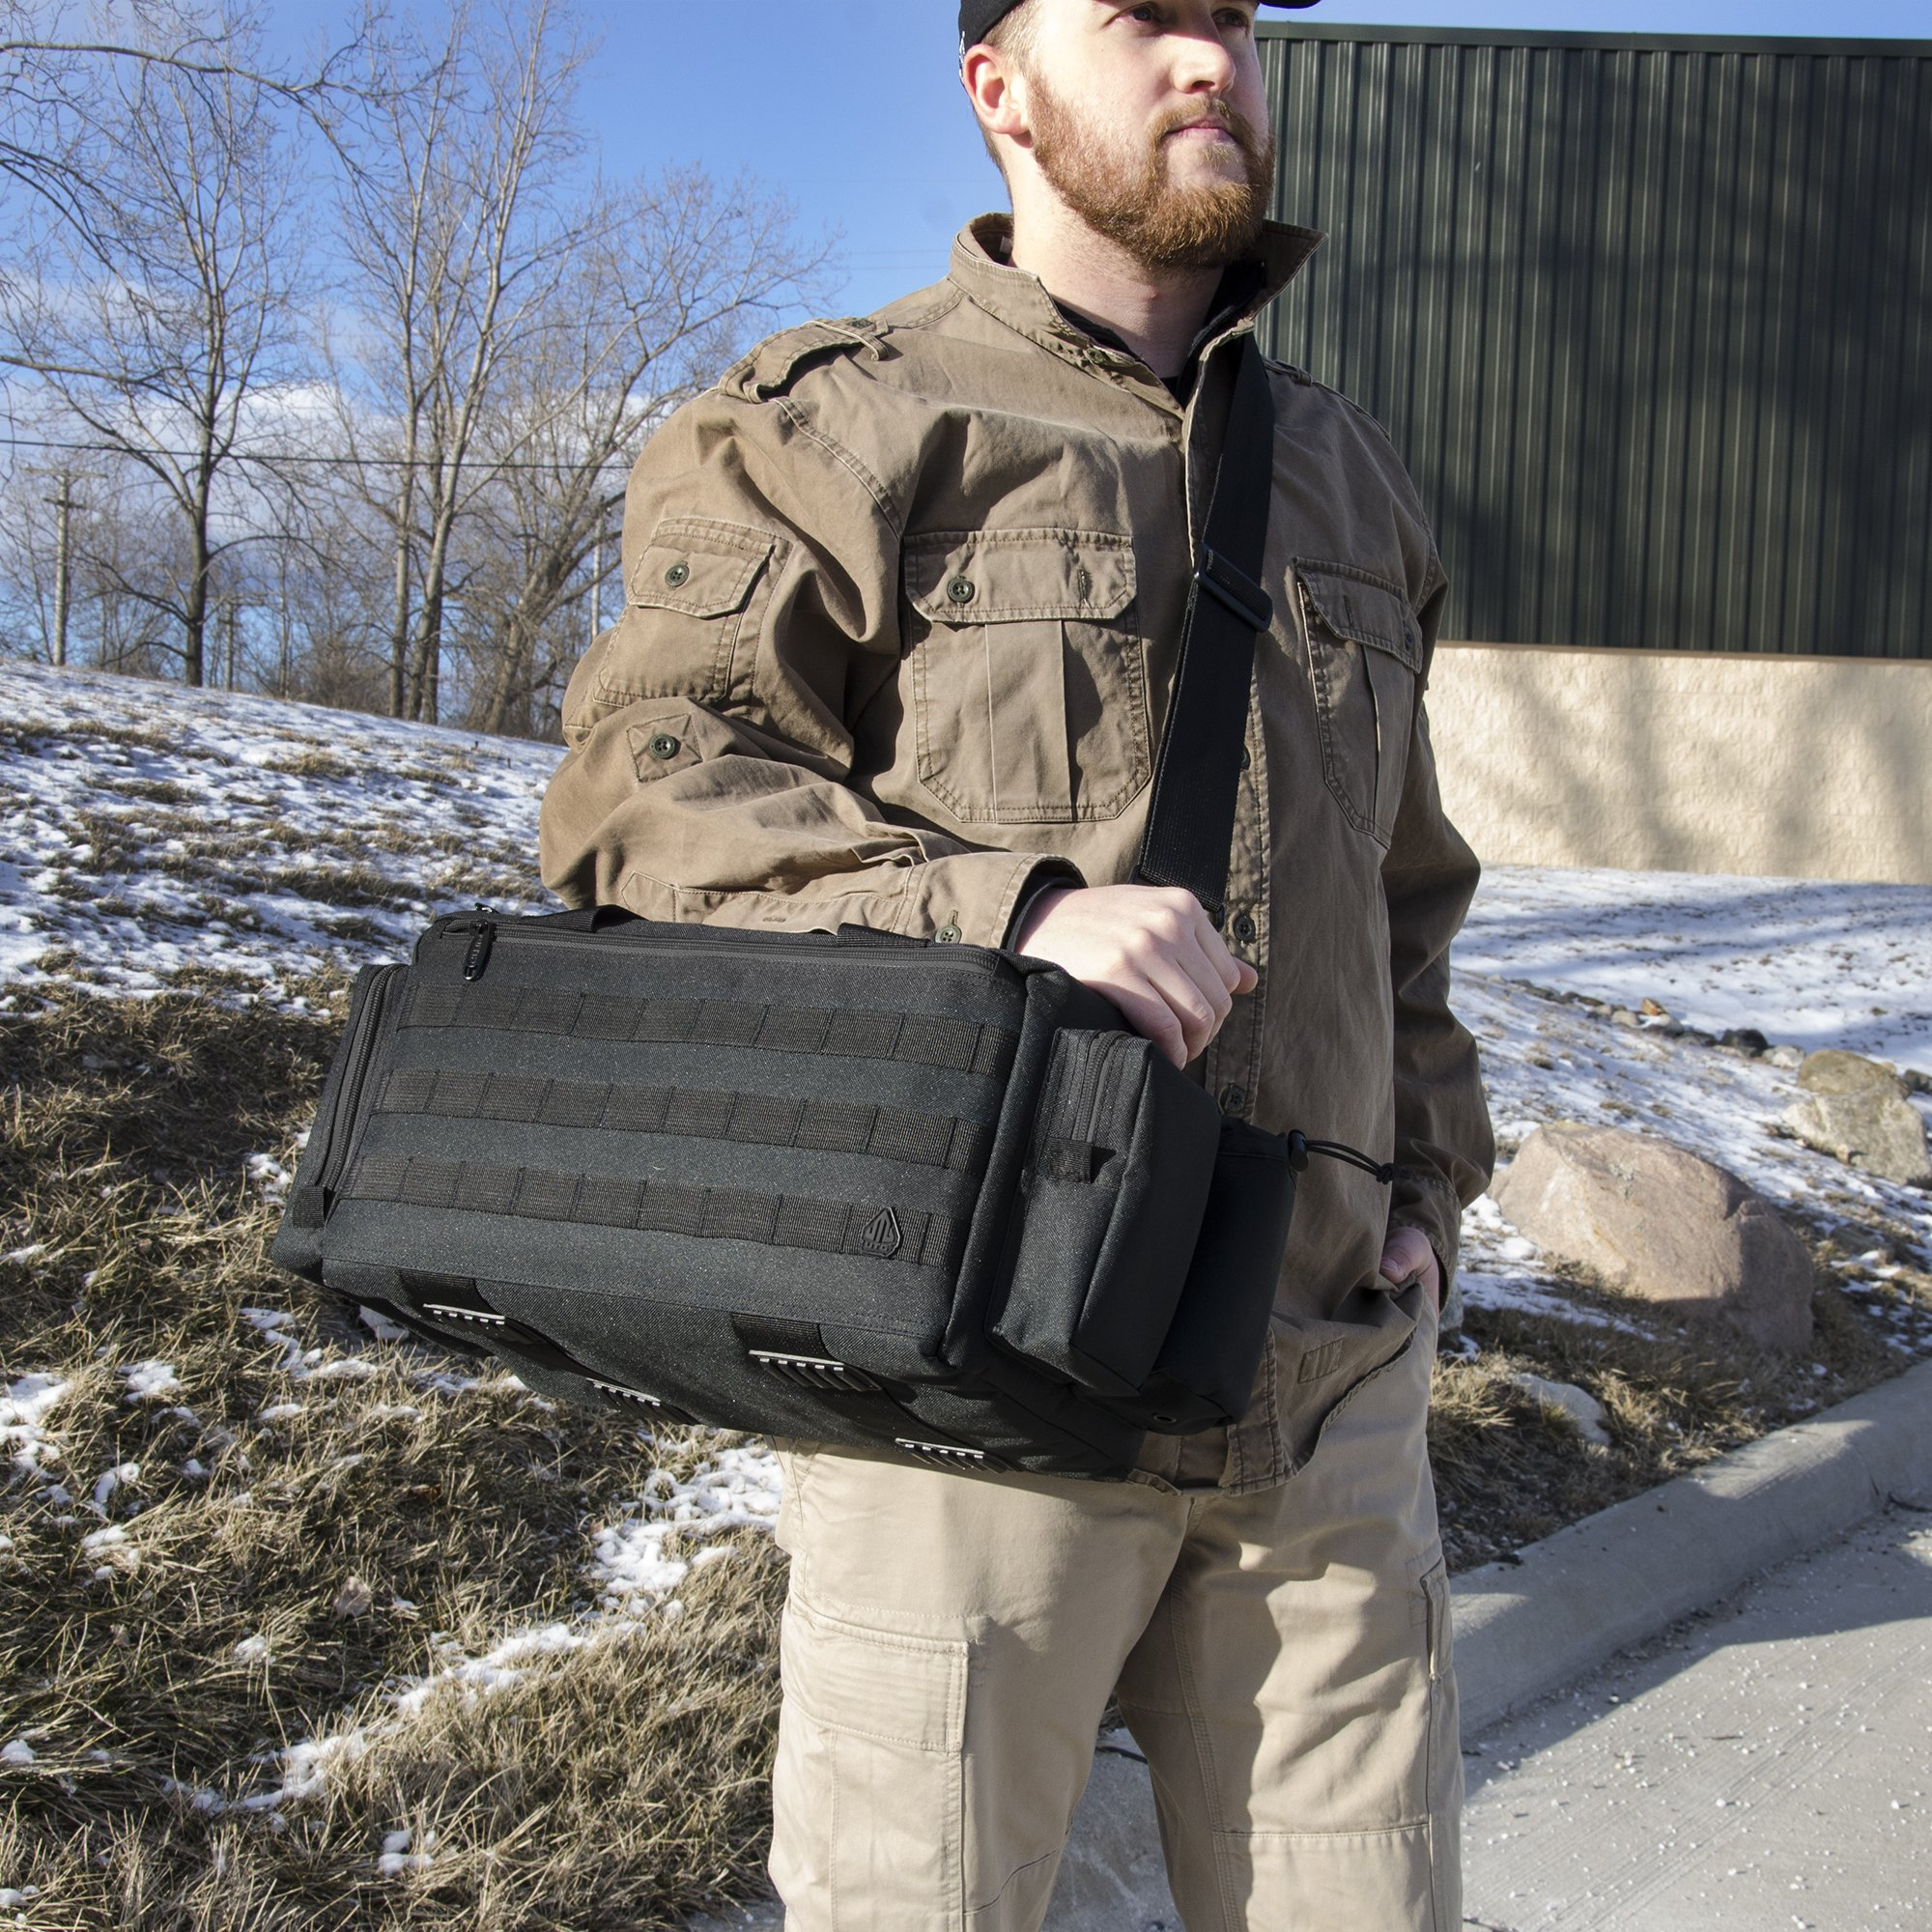 UTG All in One Range/Utility Go Bag, Black, 21'' x 10'' x 9'' by UTG (Image #3)